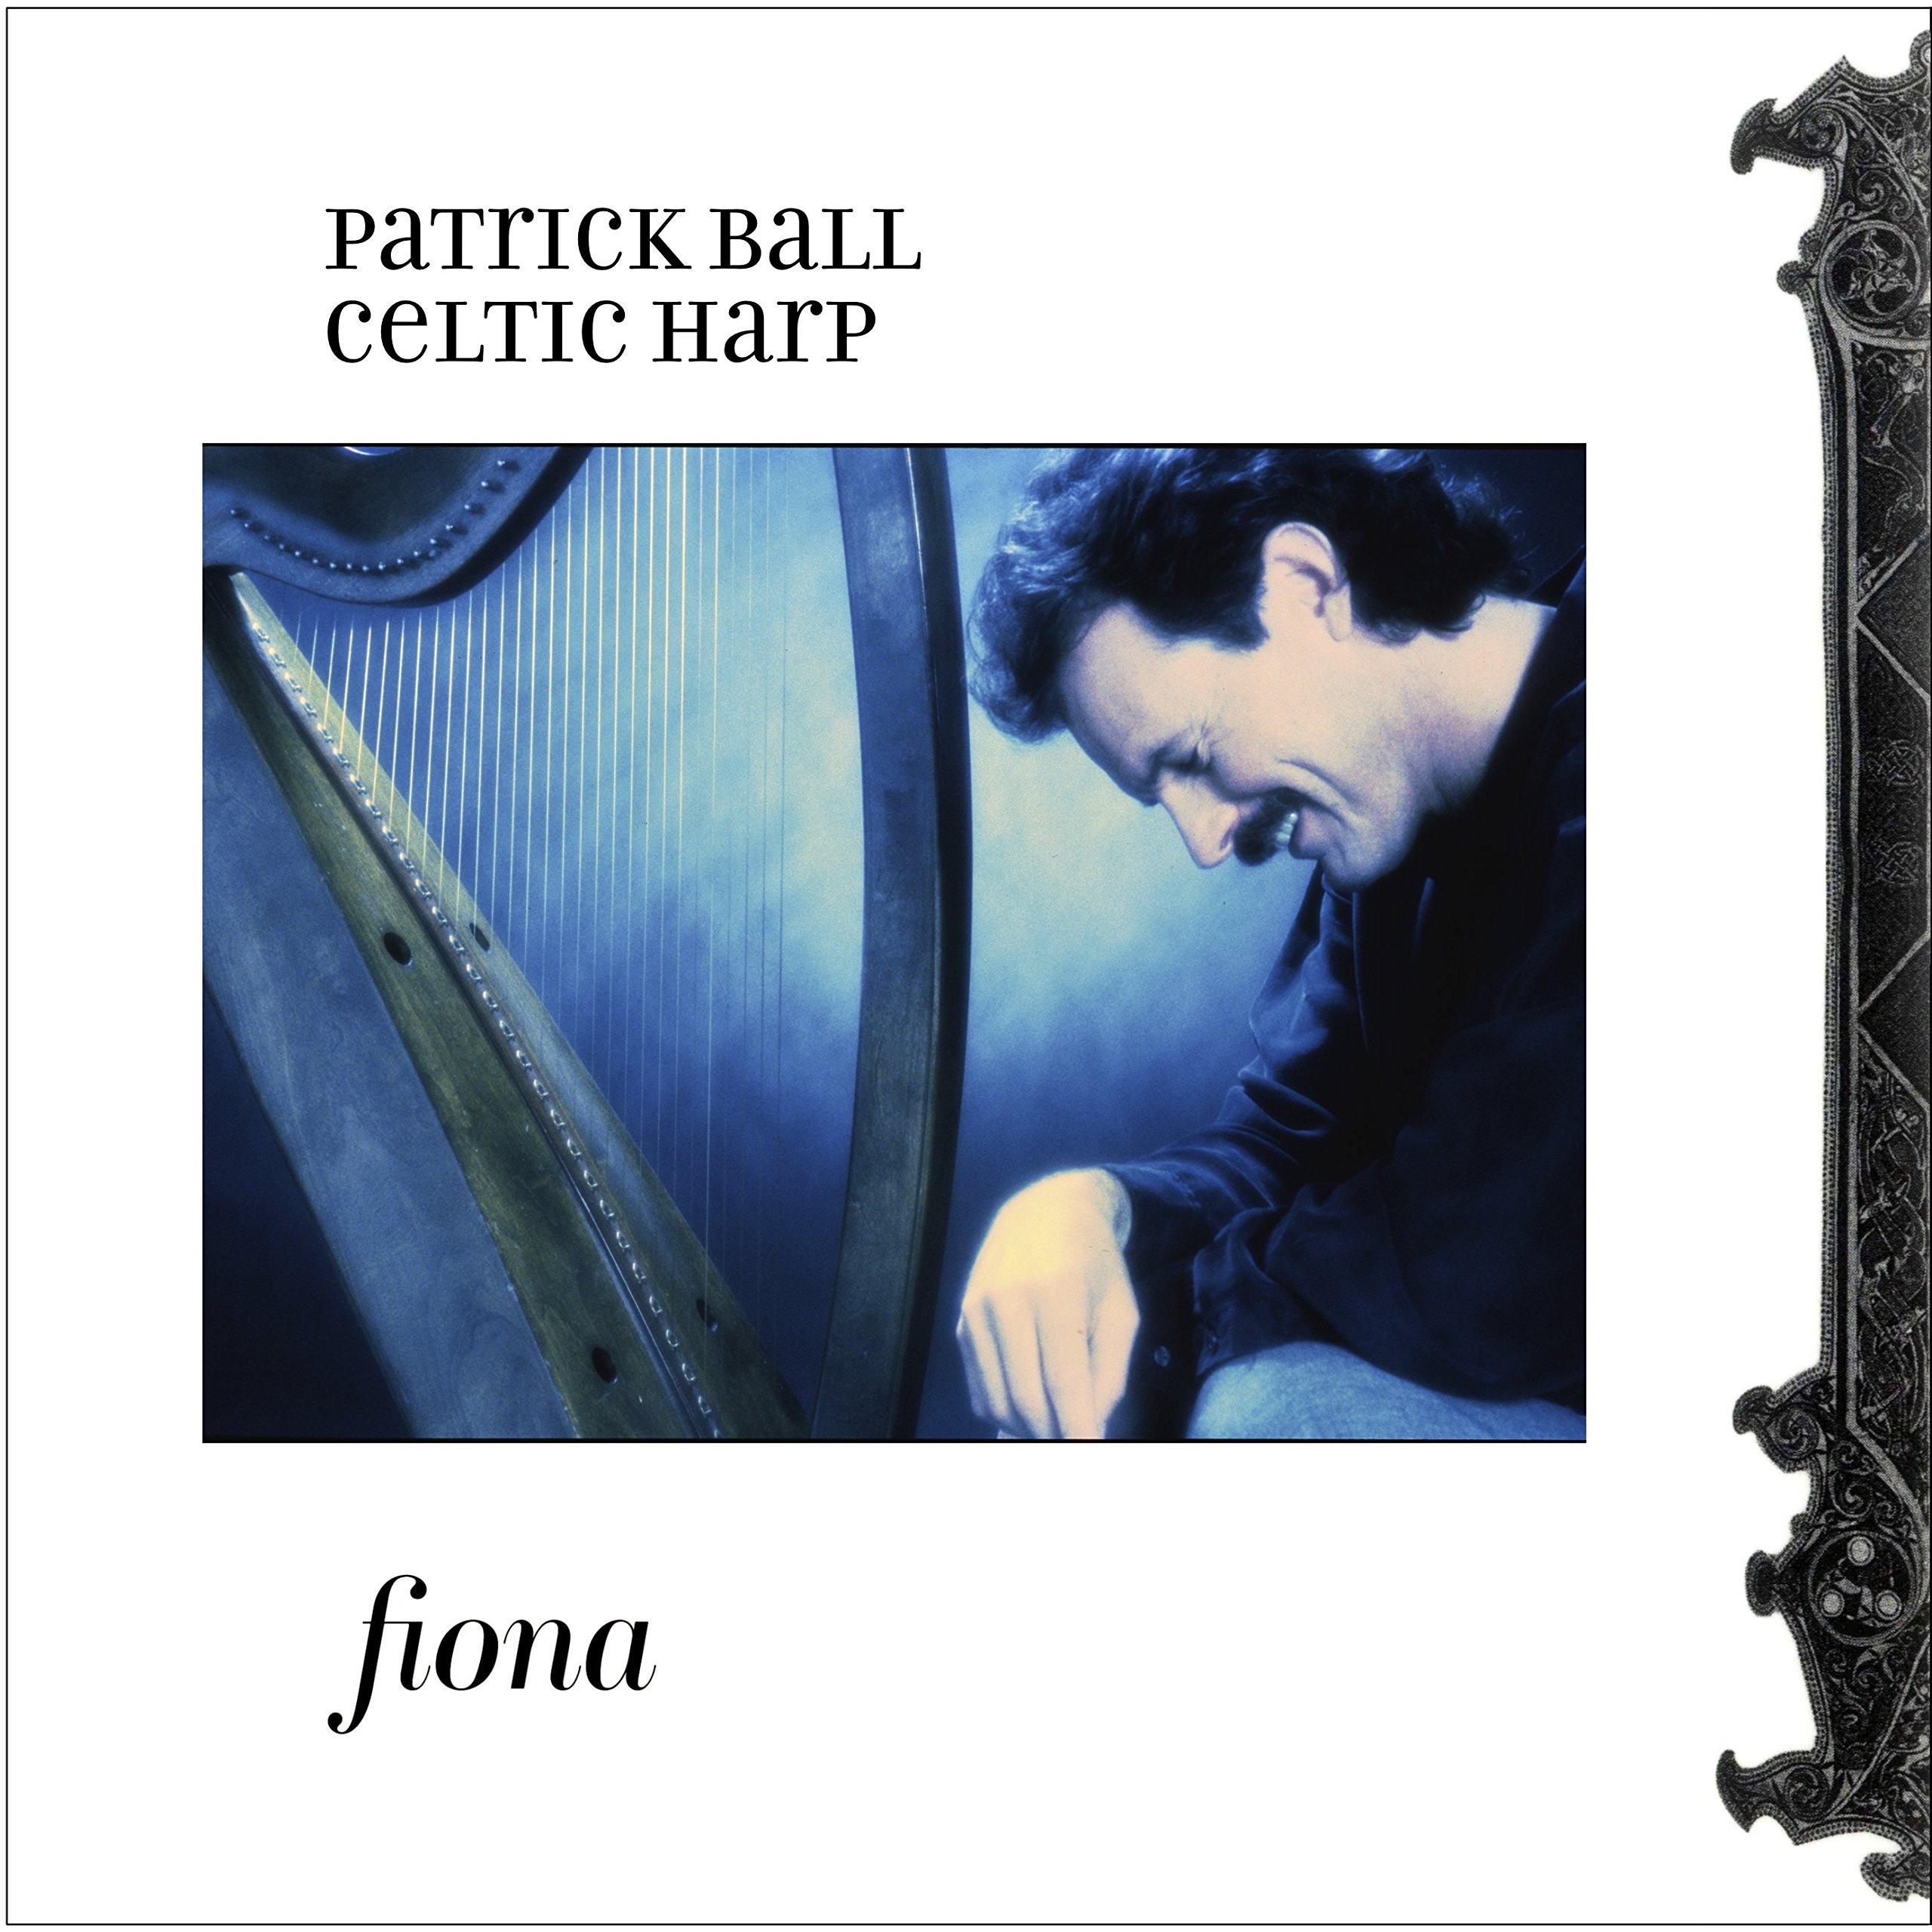 Fiona (Celtic Harp) by Celestial Harmonies